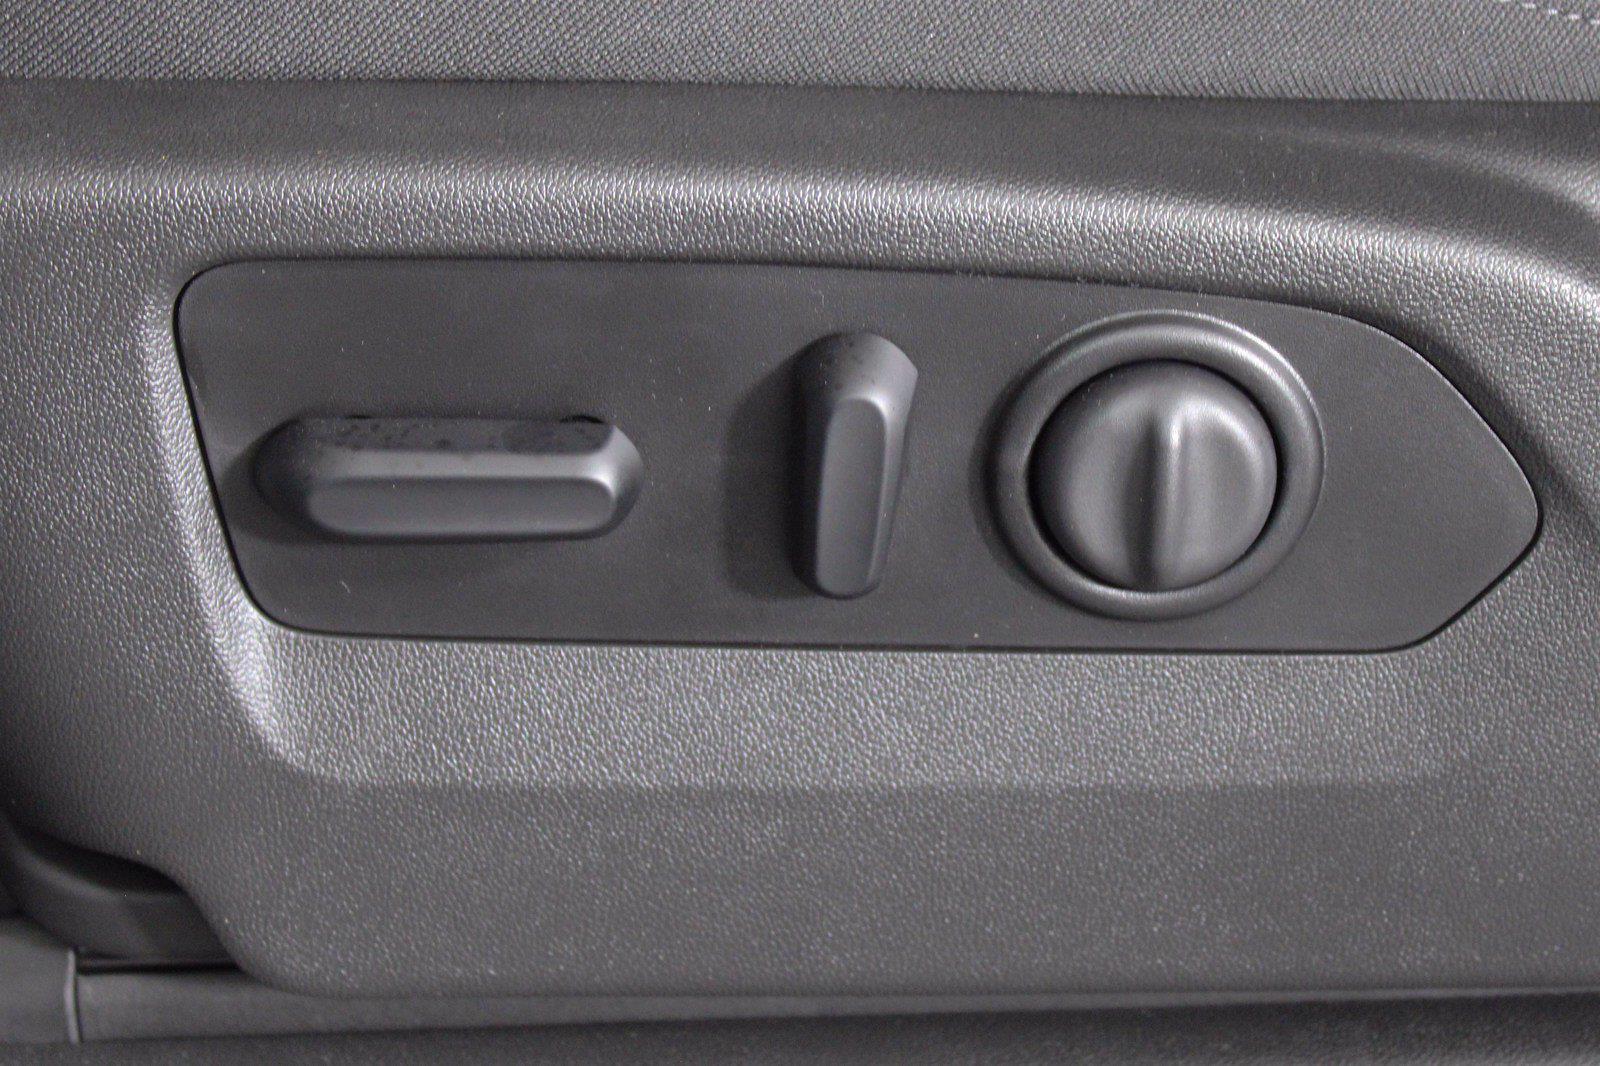 2022 Sierra 2500 Regular Cab 4x4,  Pickup #D420025 - photo 29